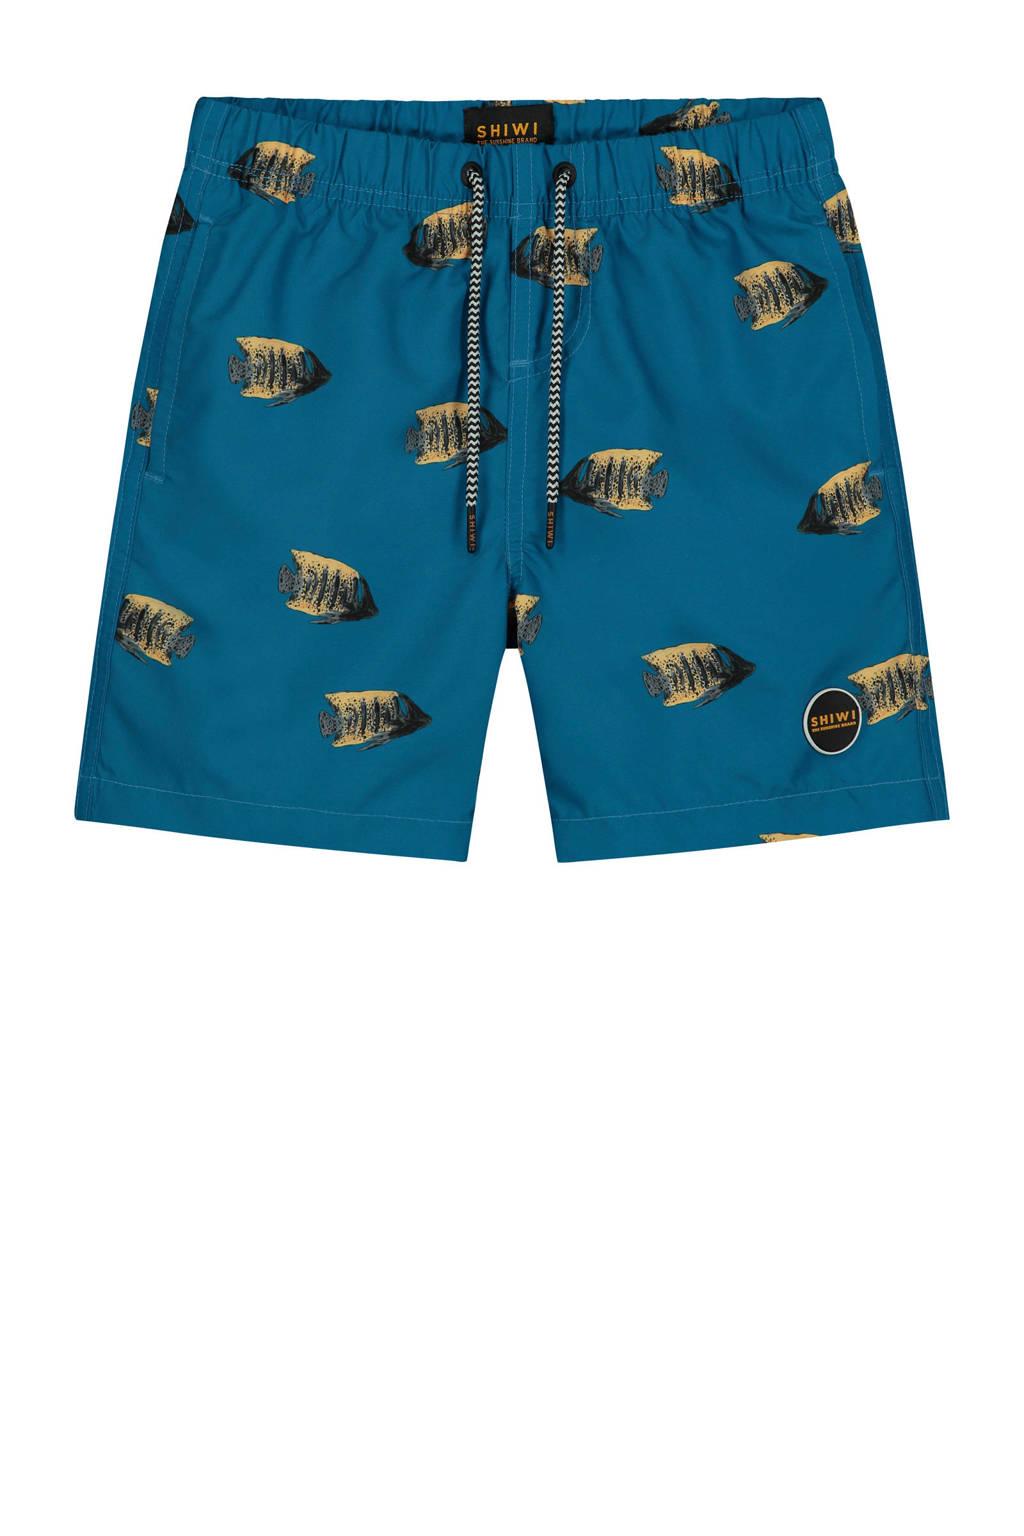 Shiwi zwemshort Moonfish blauw/oranje, Blauw/oranje